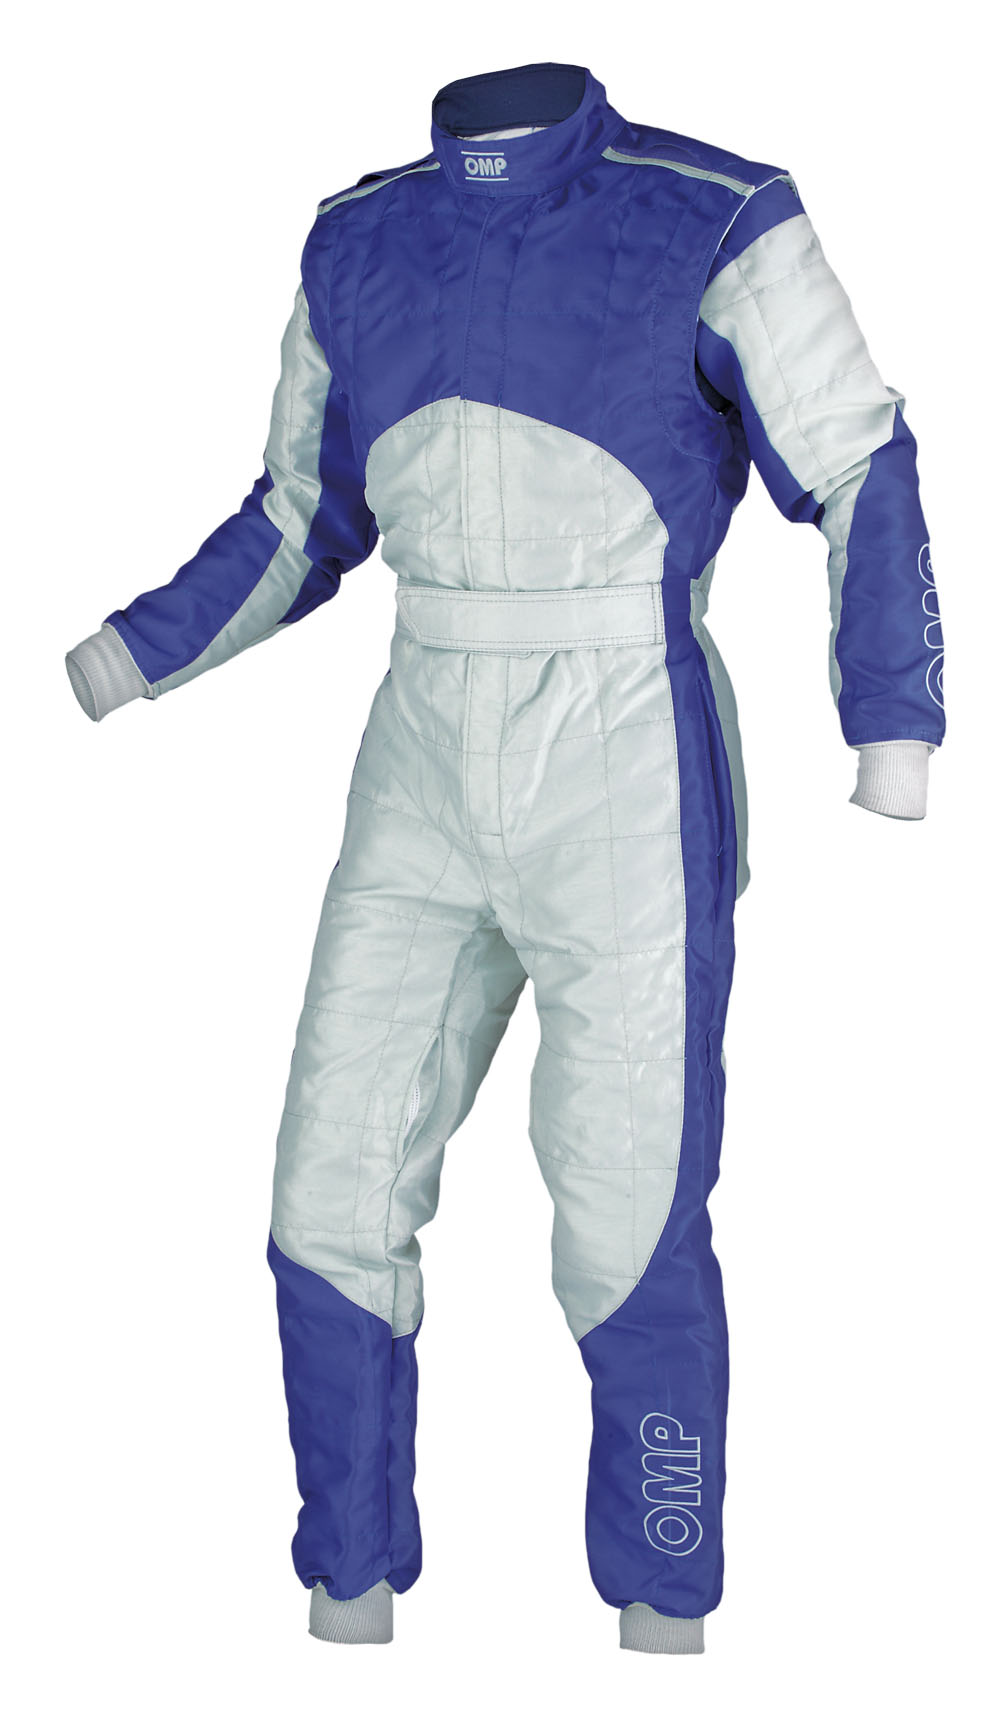 Sale Kk01710 Omp Thunder Kart Suit Fia Size 36 Grey Blue